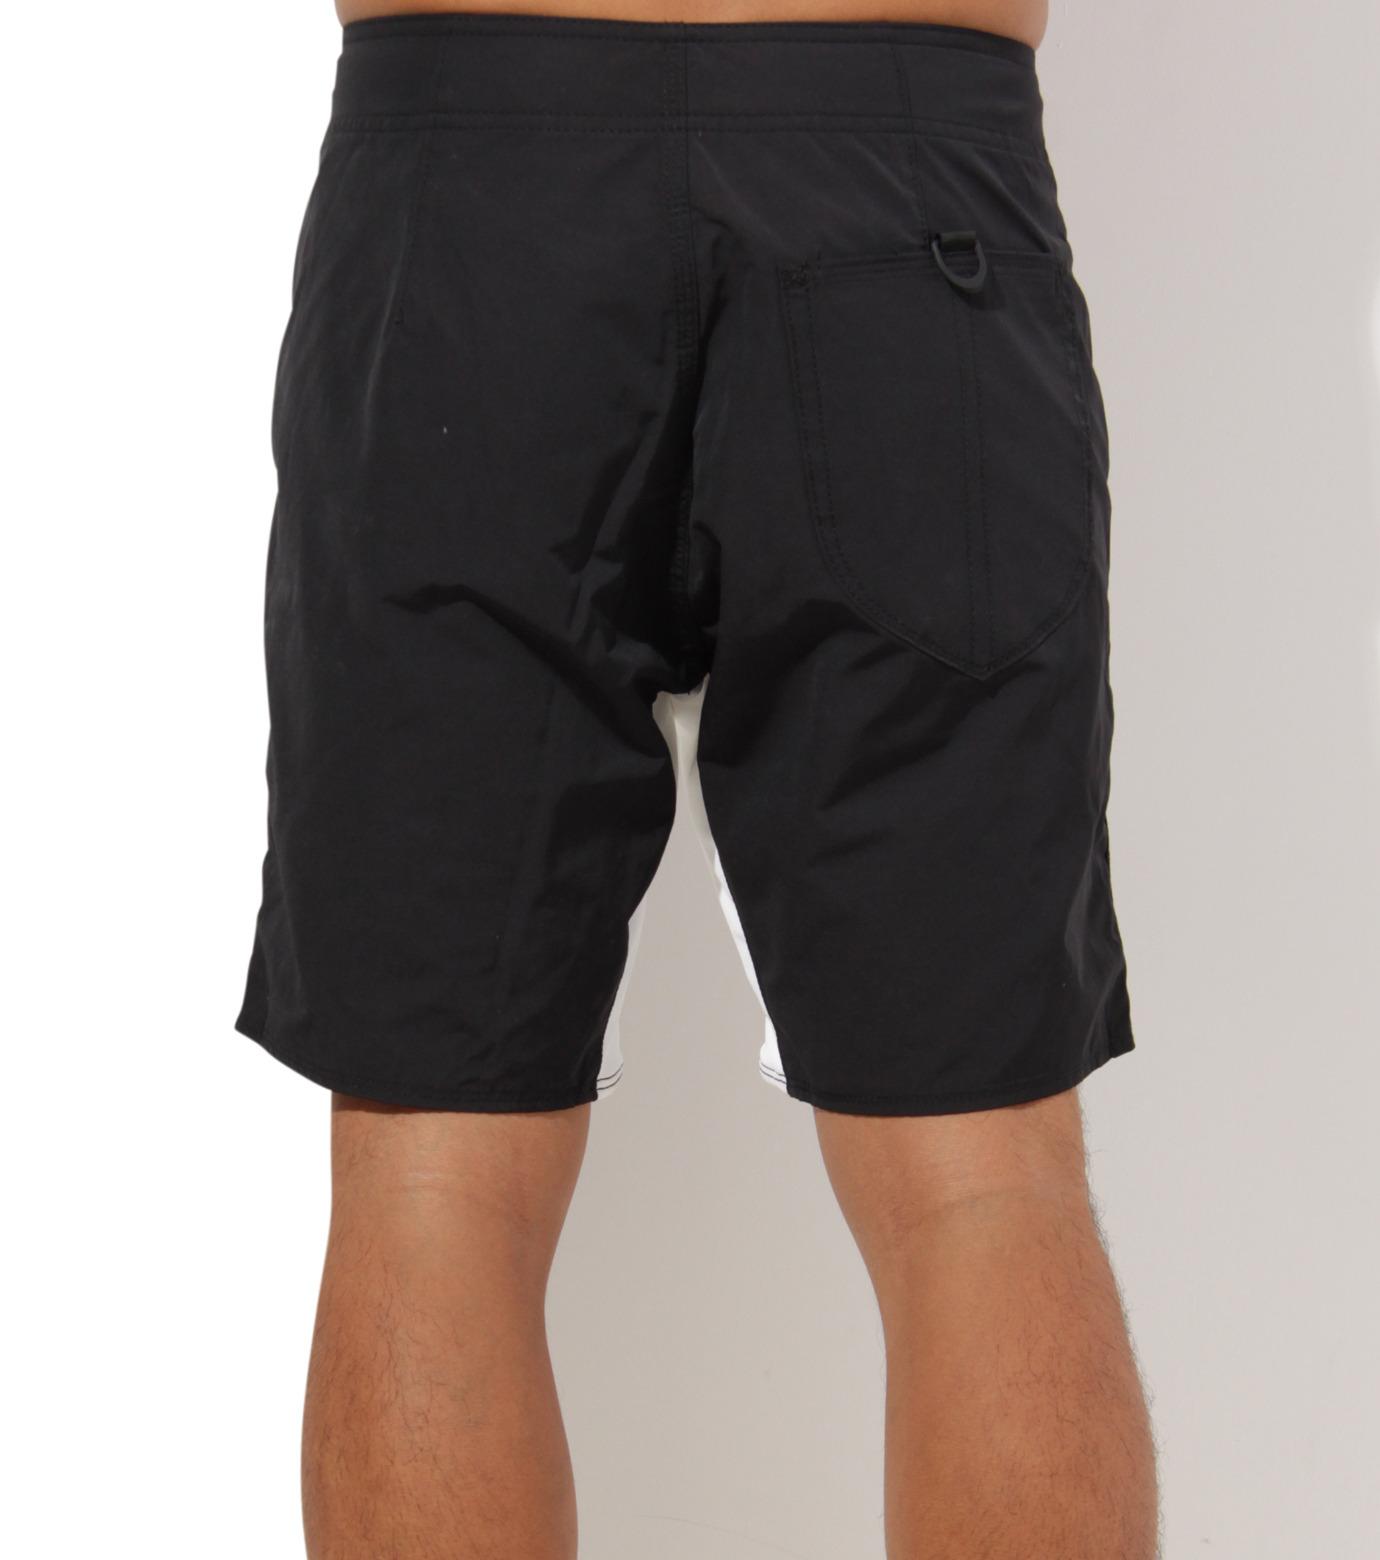 TWO TWO ONE(トゥートゥーワン)のSurf shorts short-WHITE(SWIMWEAR/SWIMWEAR)-15N948001-4 拡大詳細画像4